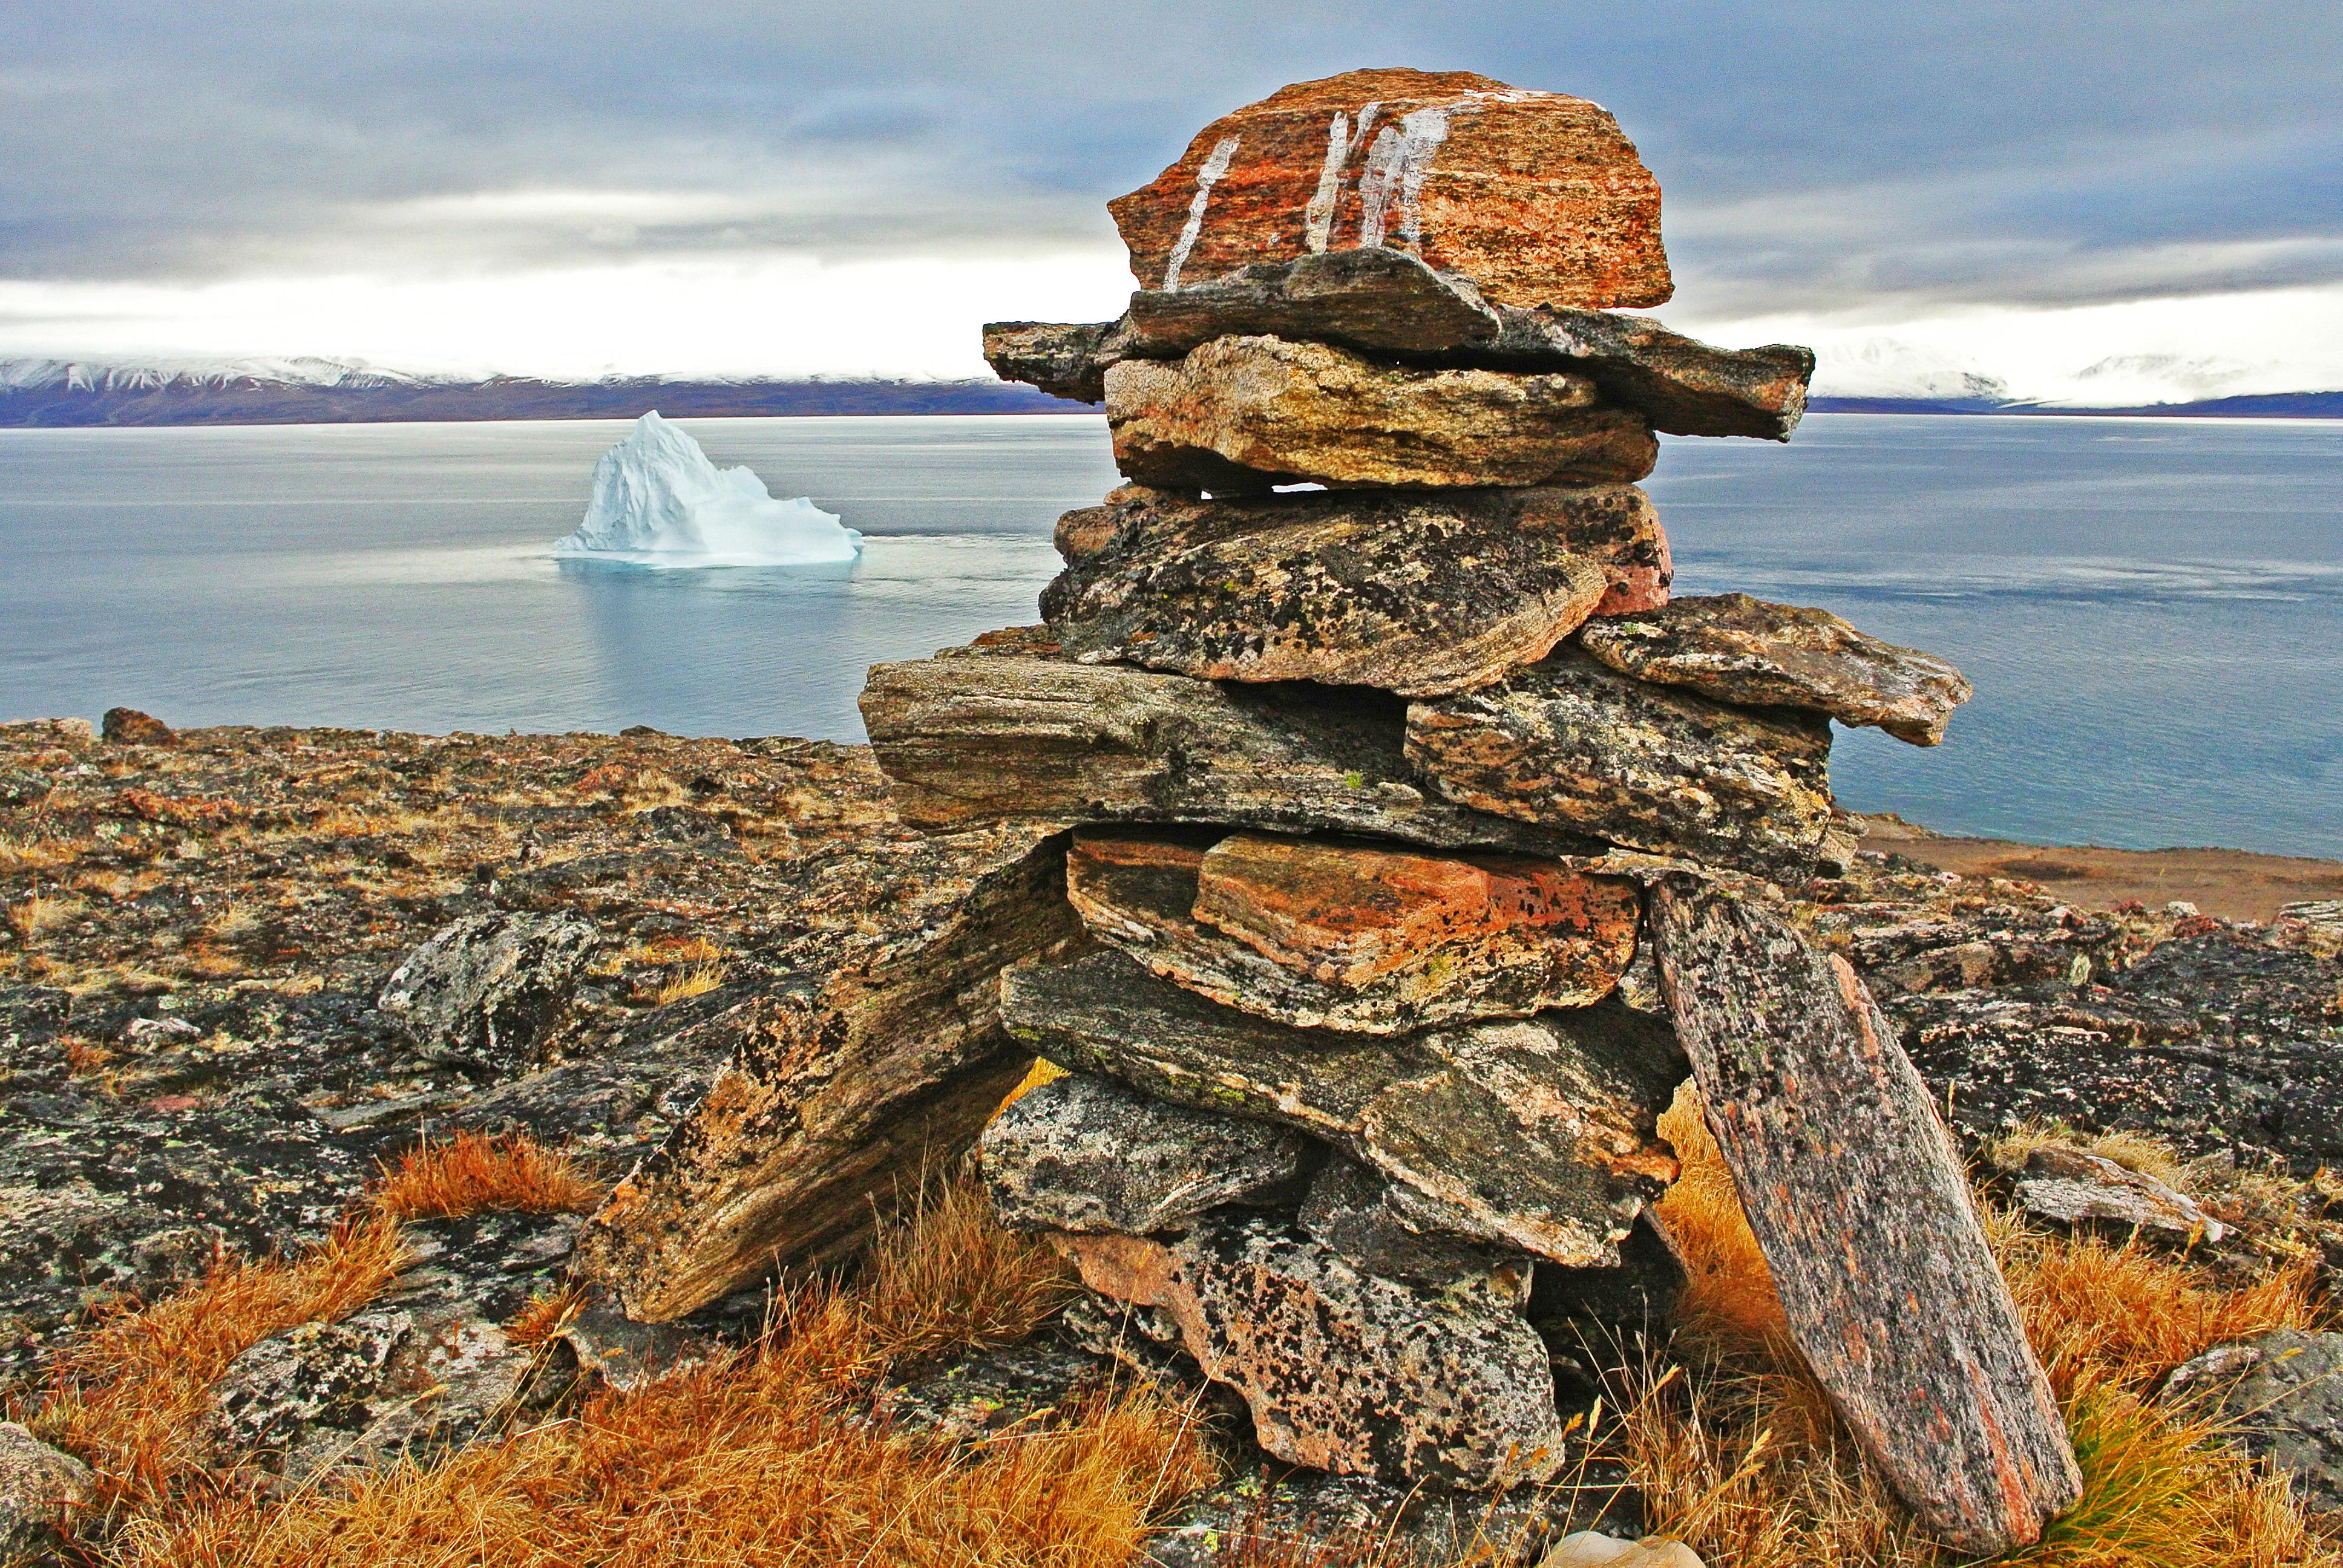 Inukshuk & Iceberg